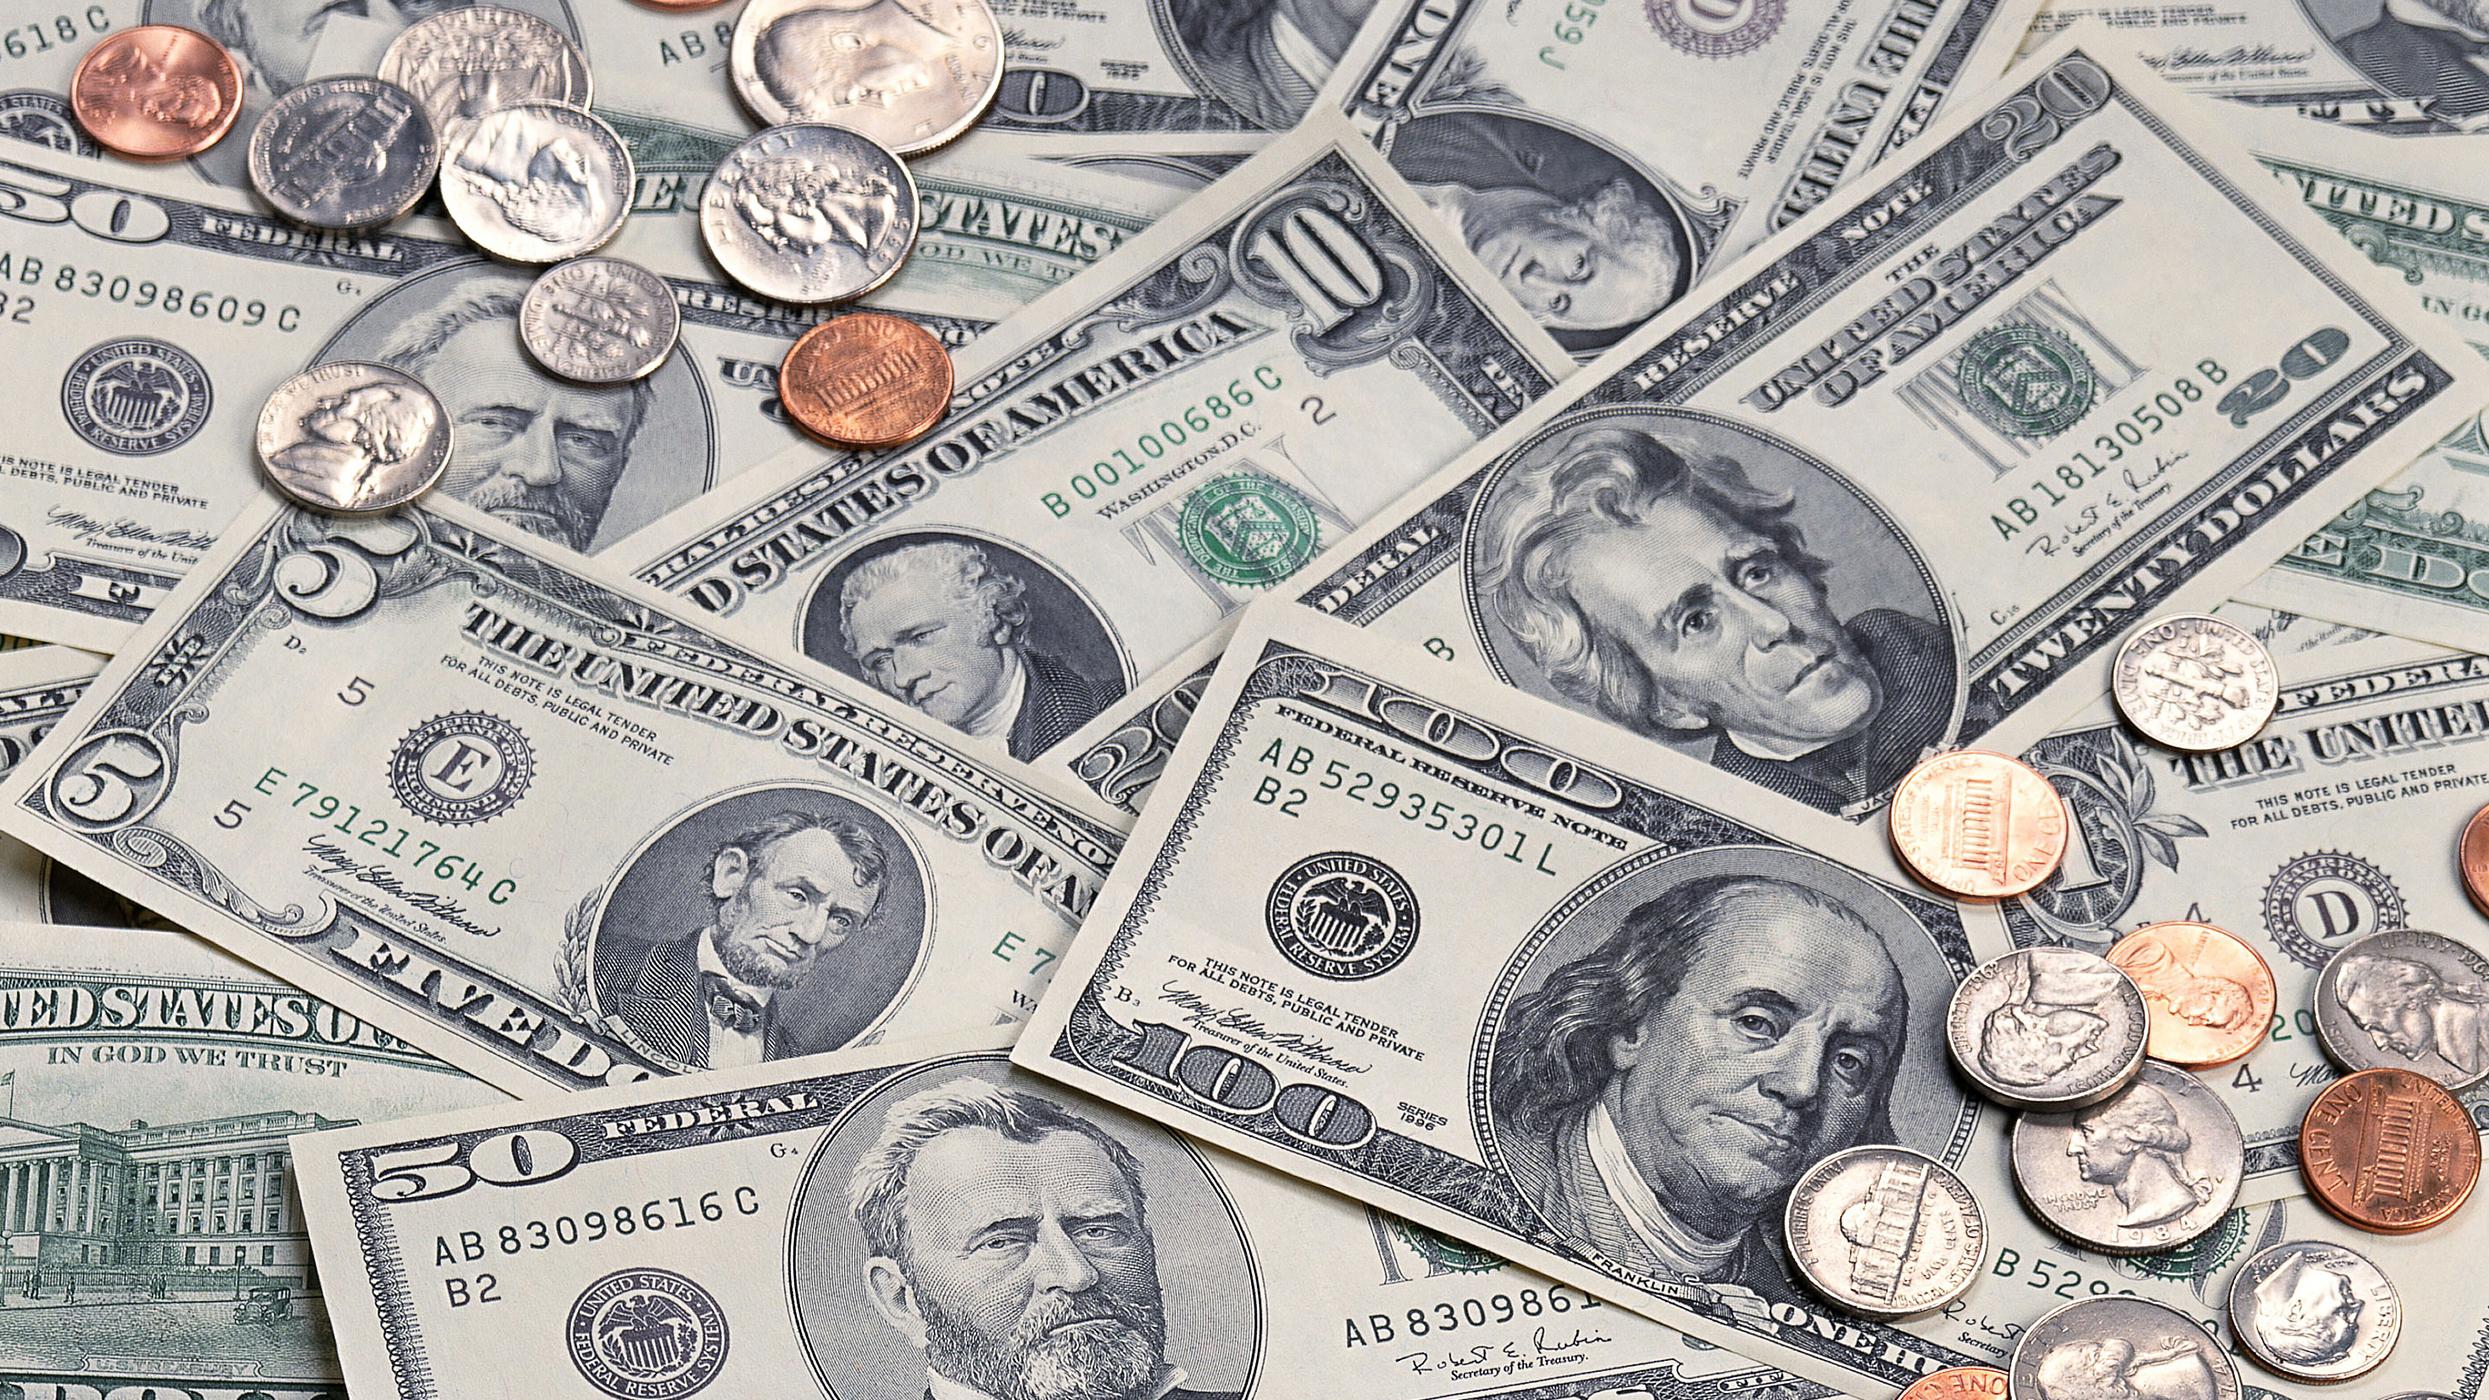 Expert: Fed easing will pressure U.S. dollar in the long run - CGTN